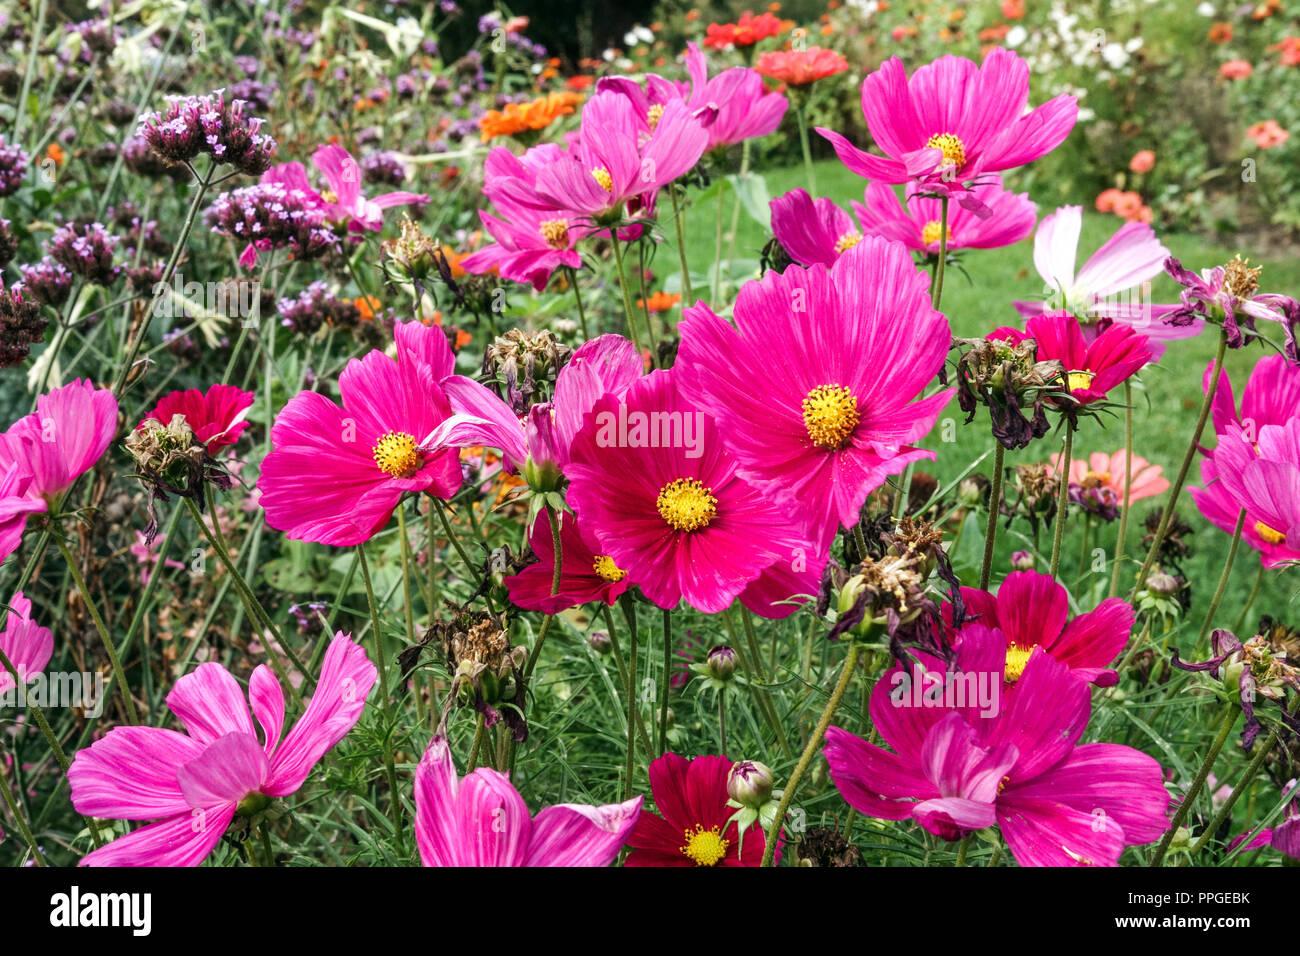 Annual flowerbed in late summer, Garden Cosmos bipinnatus - Stock Image